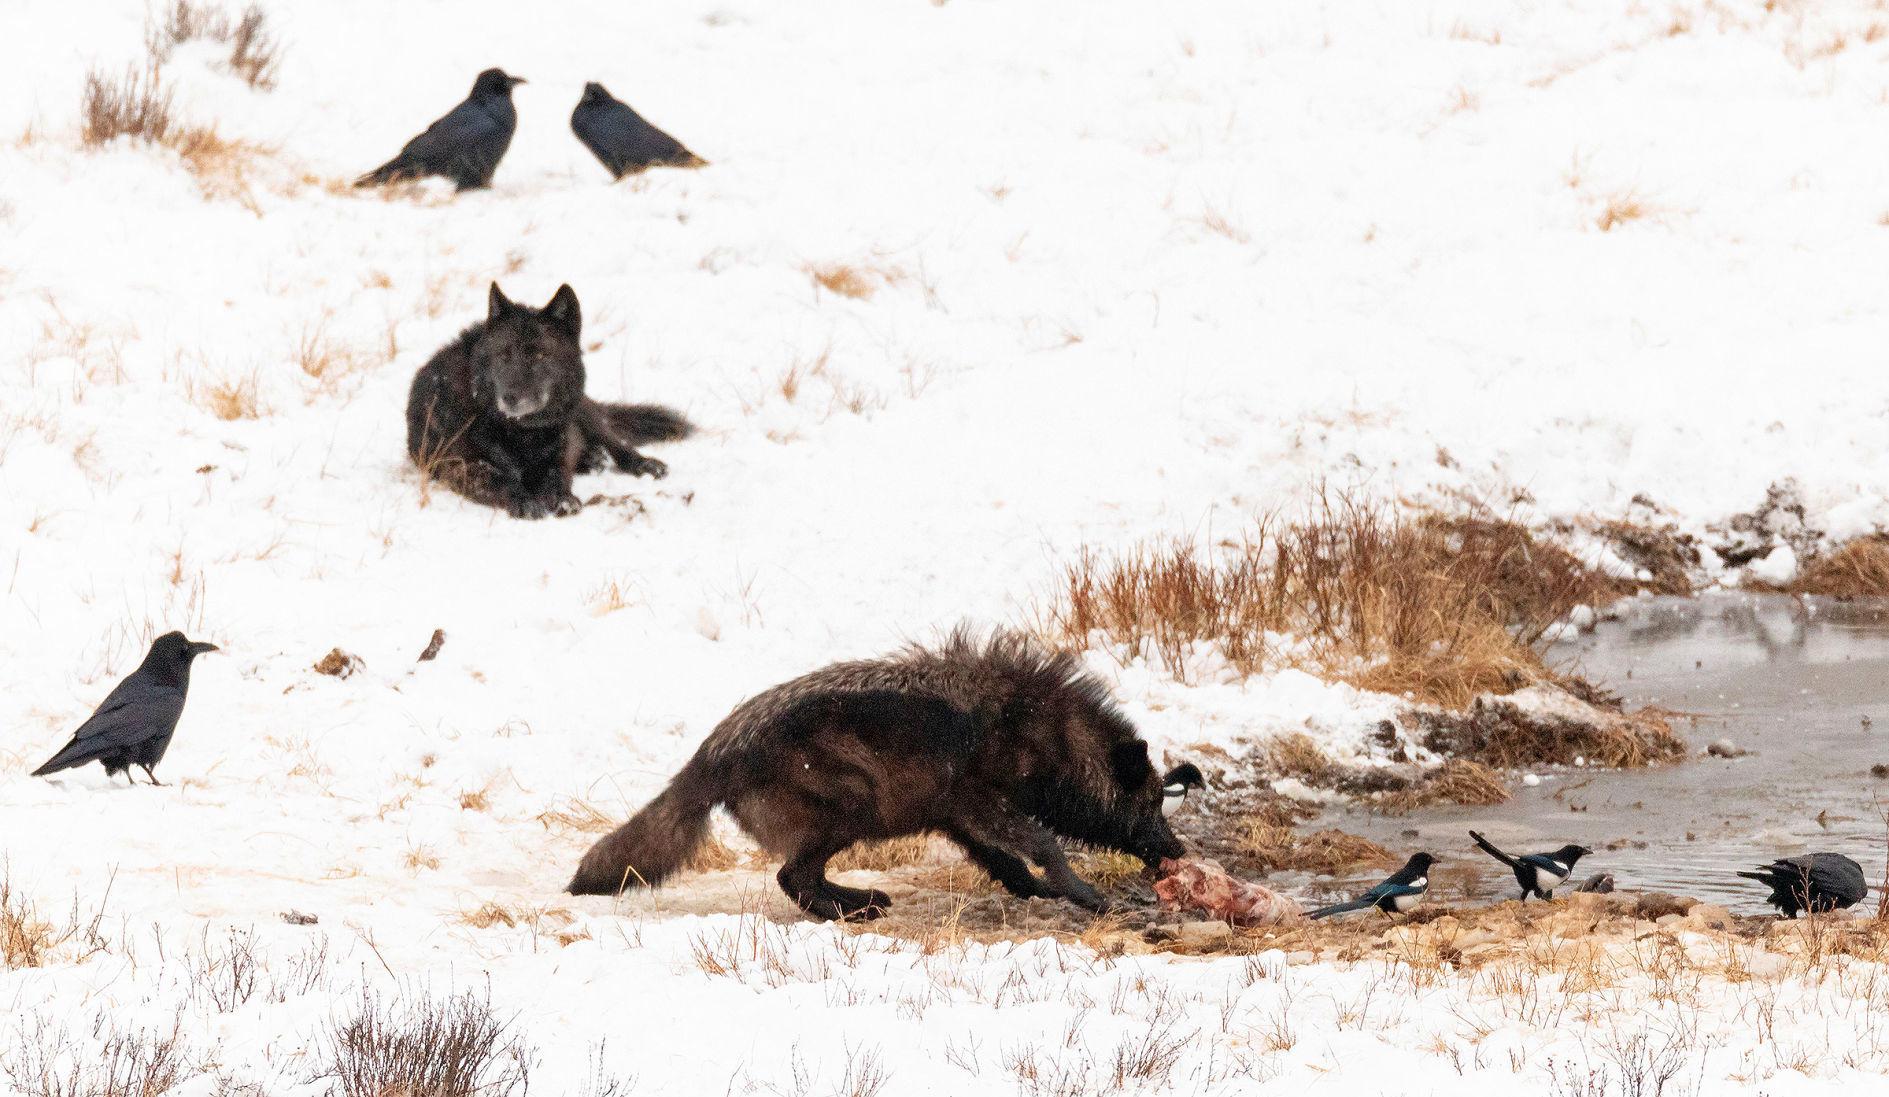 WALLPAPER BORDER FOX DEER WOLVES WOLF BEAR IN FRAMES NEW ARRIVAL WILD ANIMALS